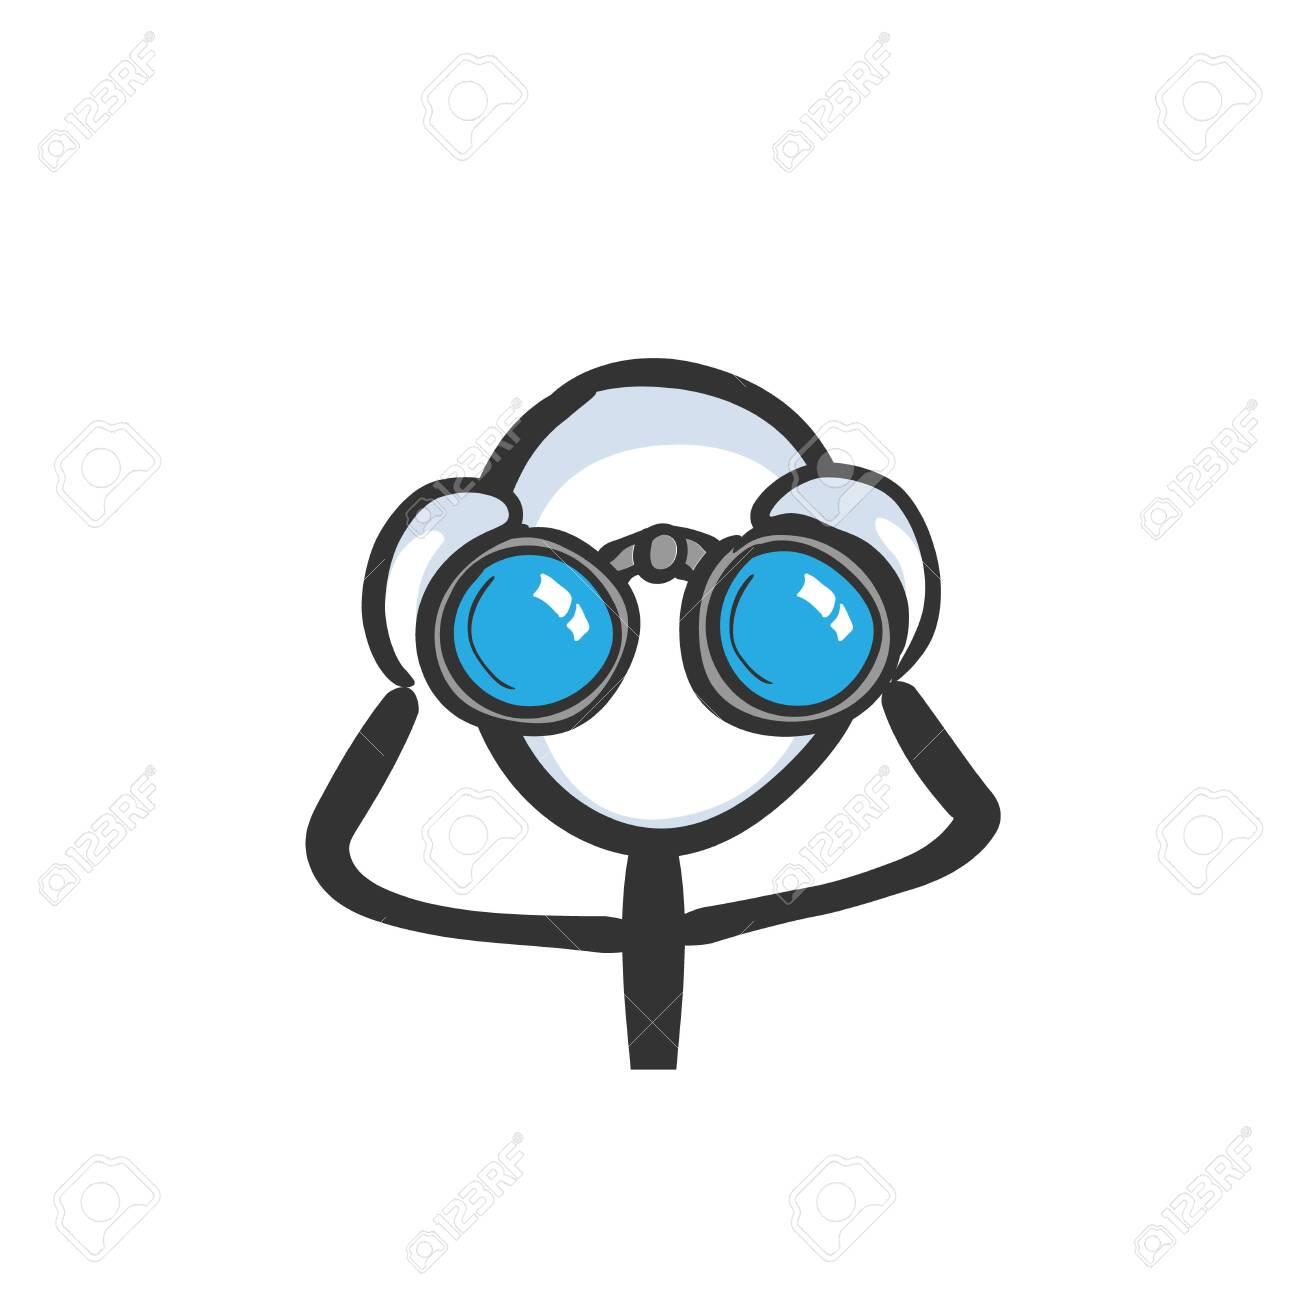 Looking into binoculars. Man spying. Looking far. Hand drawn. Stickman cartoon. Doodle sketch, Vector graphic illustration binoculars - 142278829